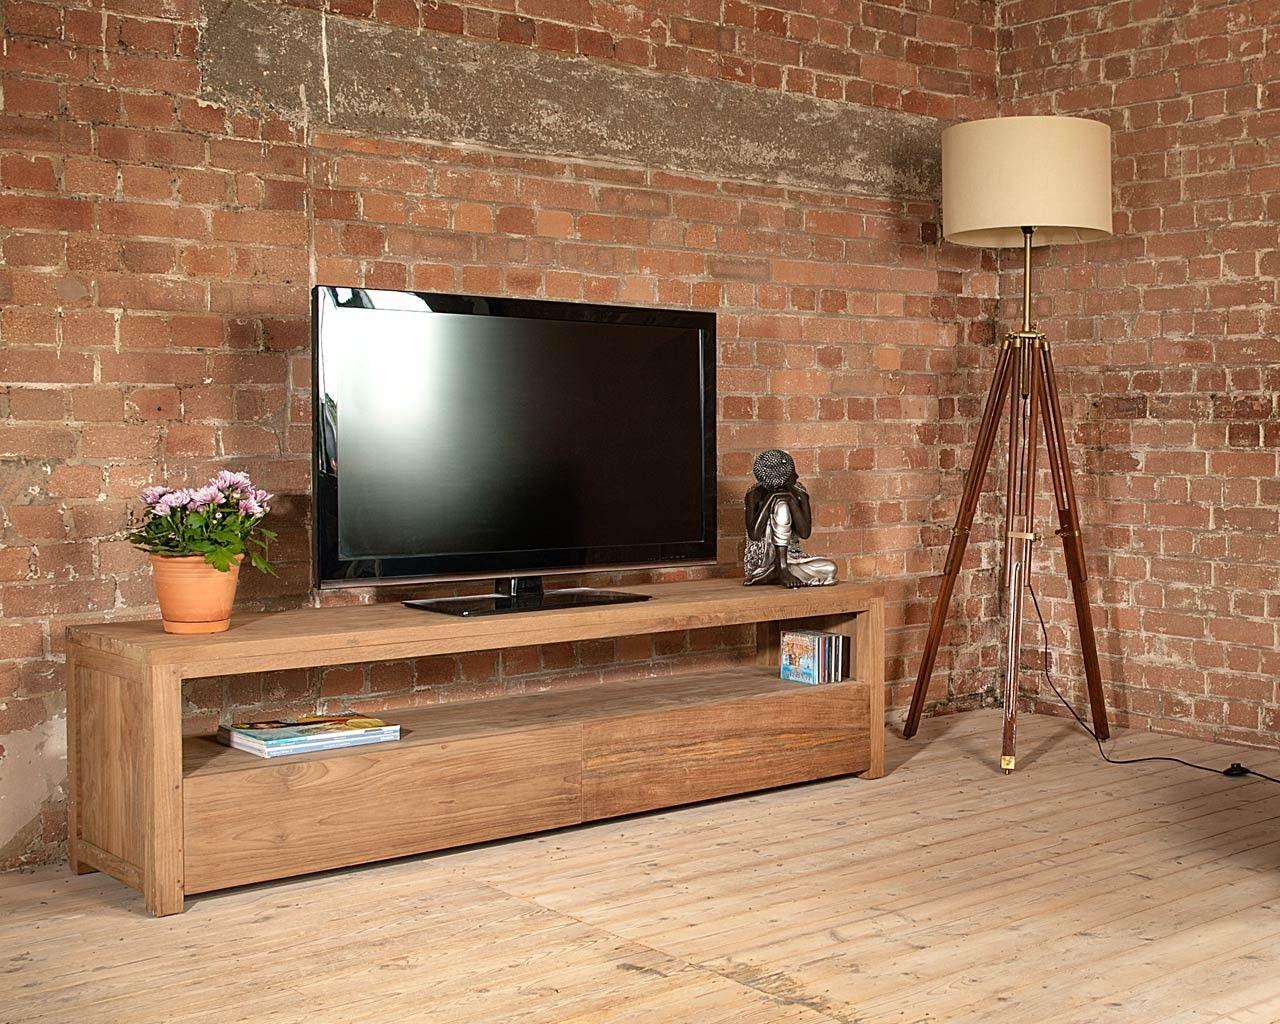 Mino Natural Plasma Unit £995 Distinctive, stylish and ... Plasma Unit Design